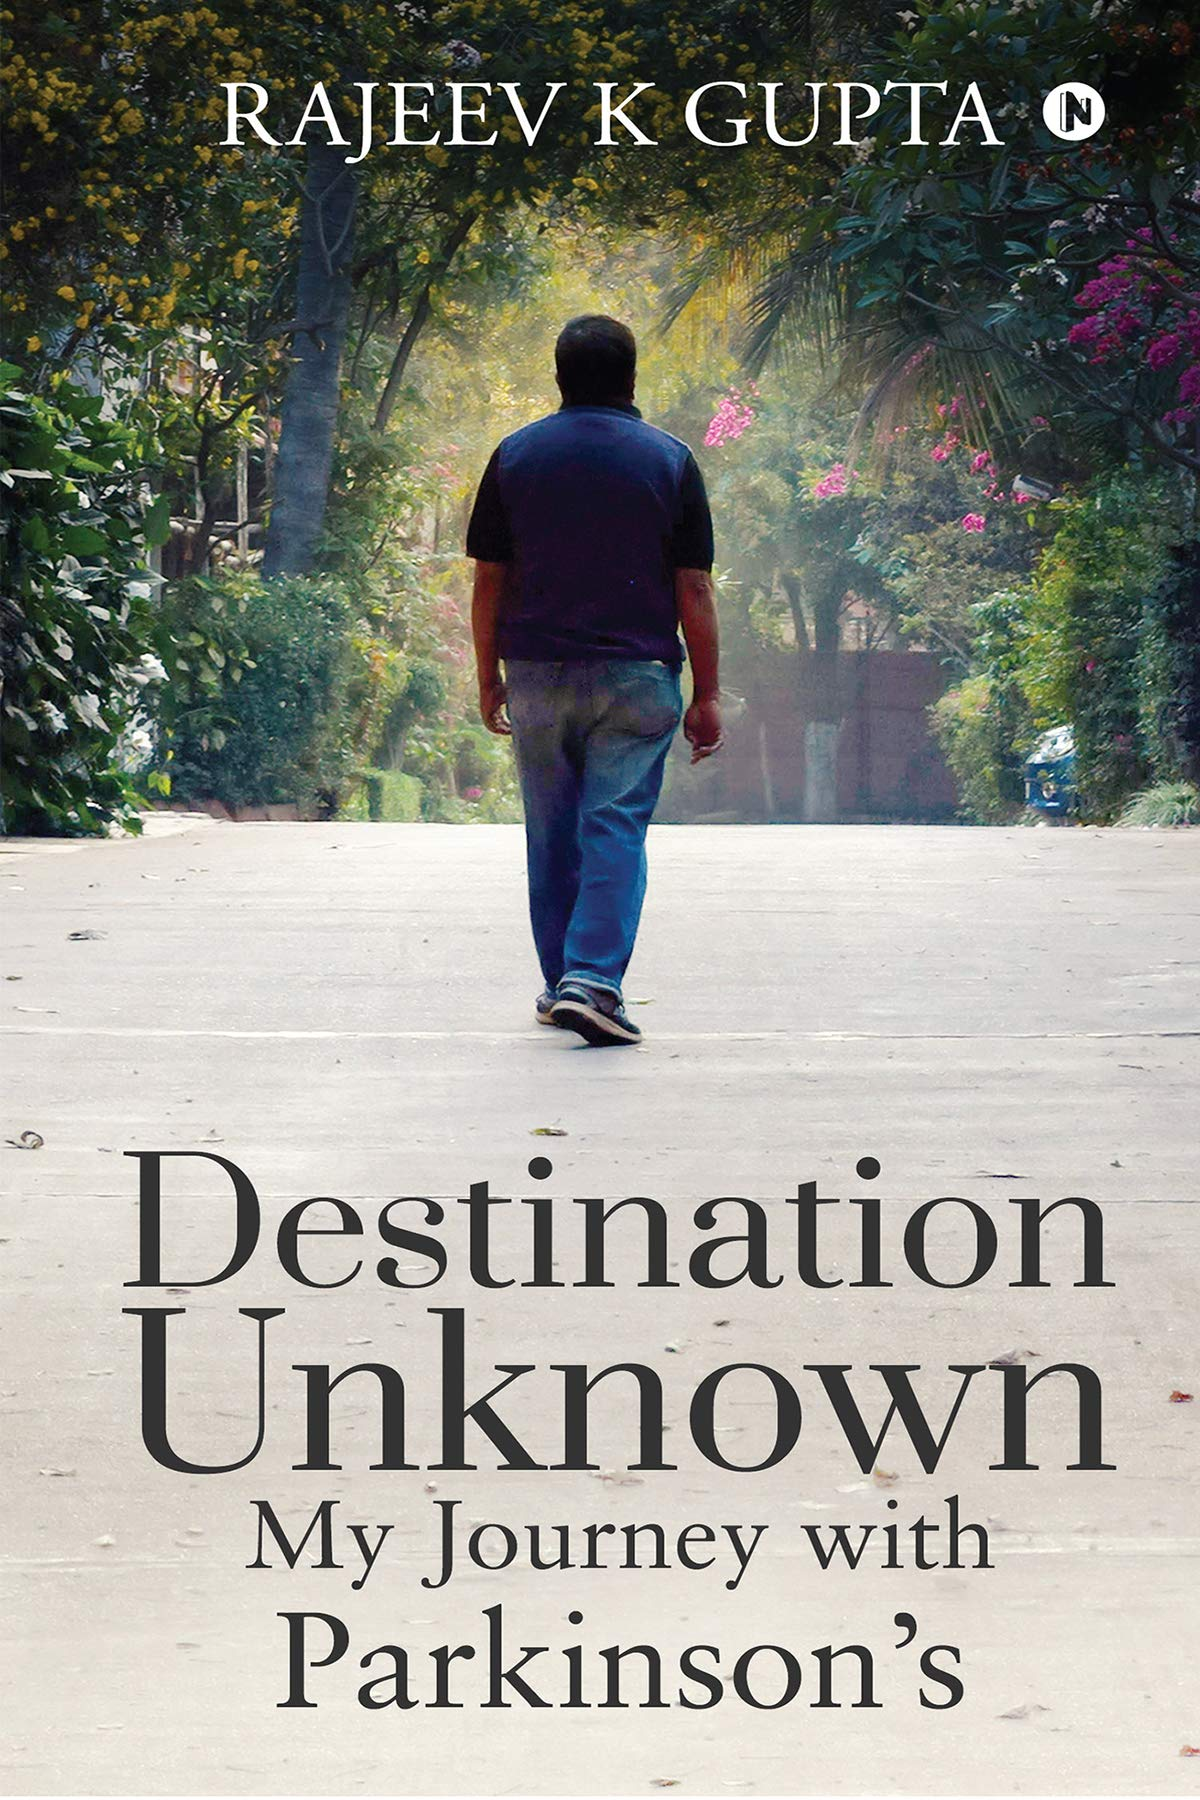 Destination Unknown - My Journey with Parkinson's